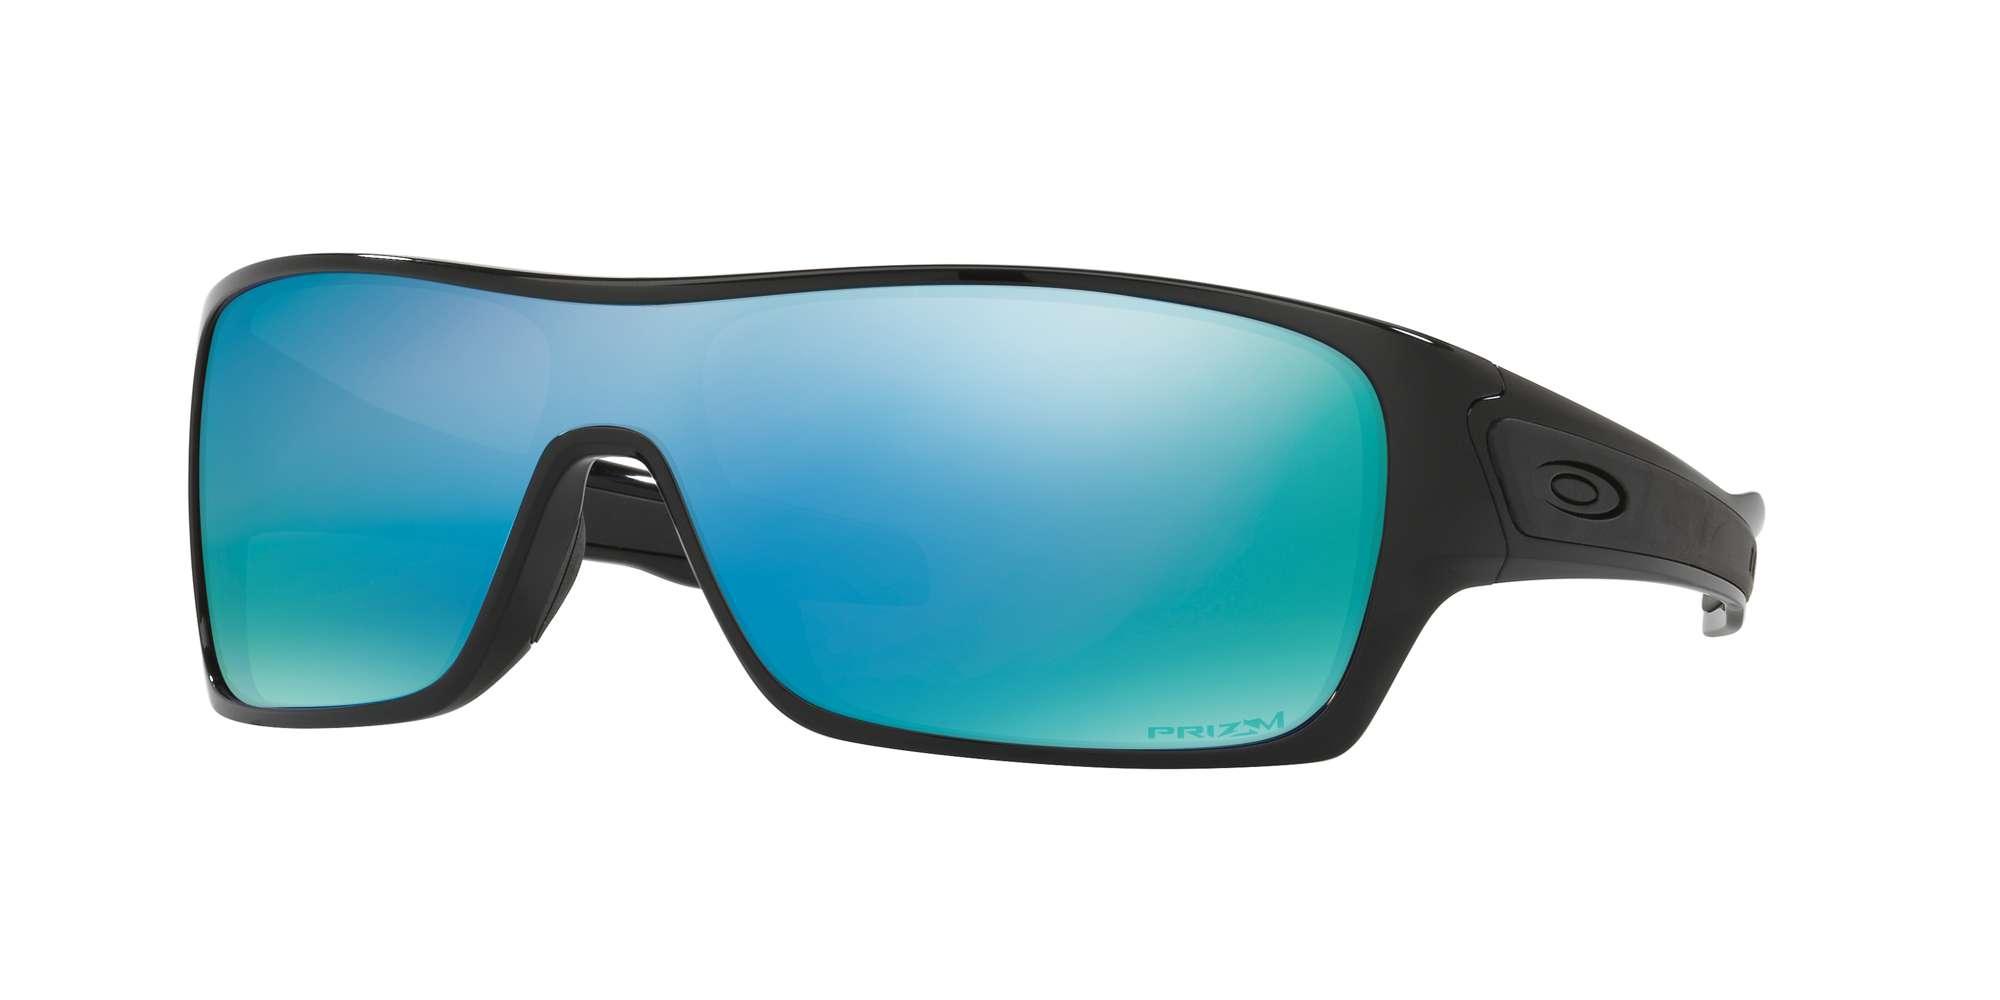 POLISHED BLACK / Prizm Deep Water Polarized lenses